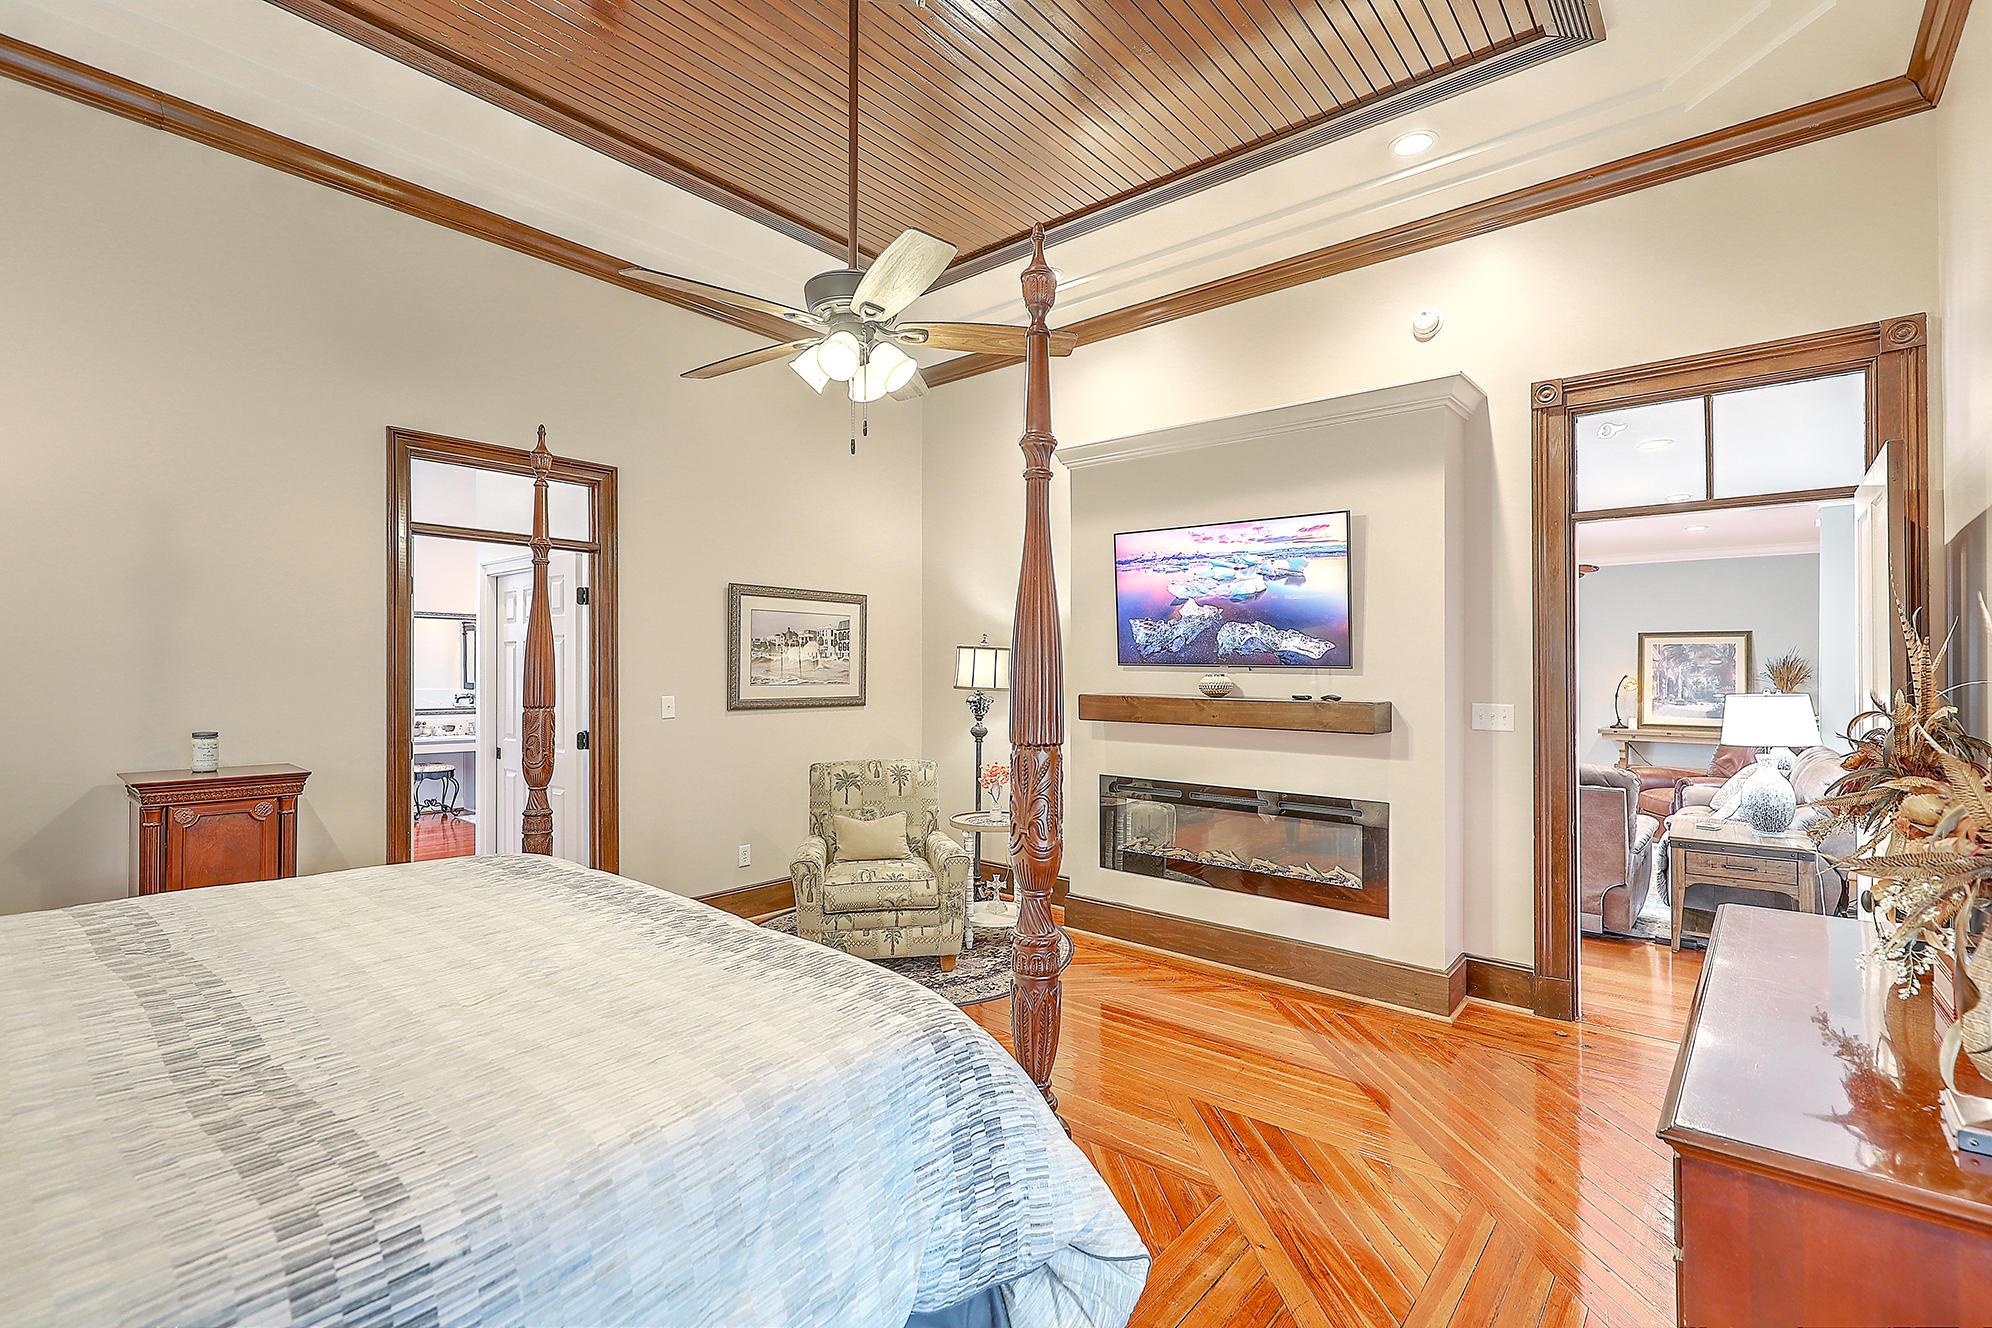 Summerville Homes For Sale - 102 Hickory, Summerville, SC - 101